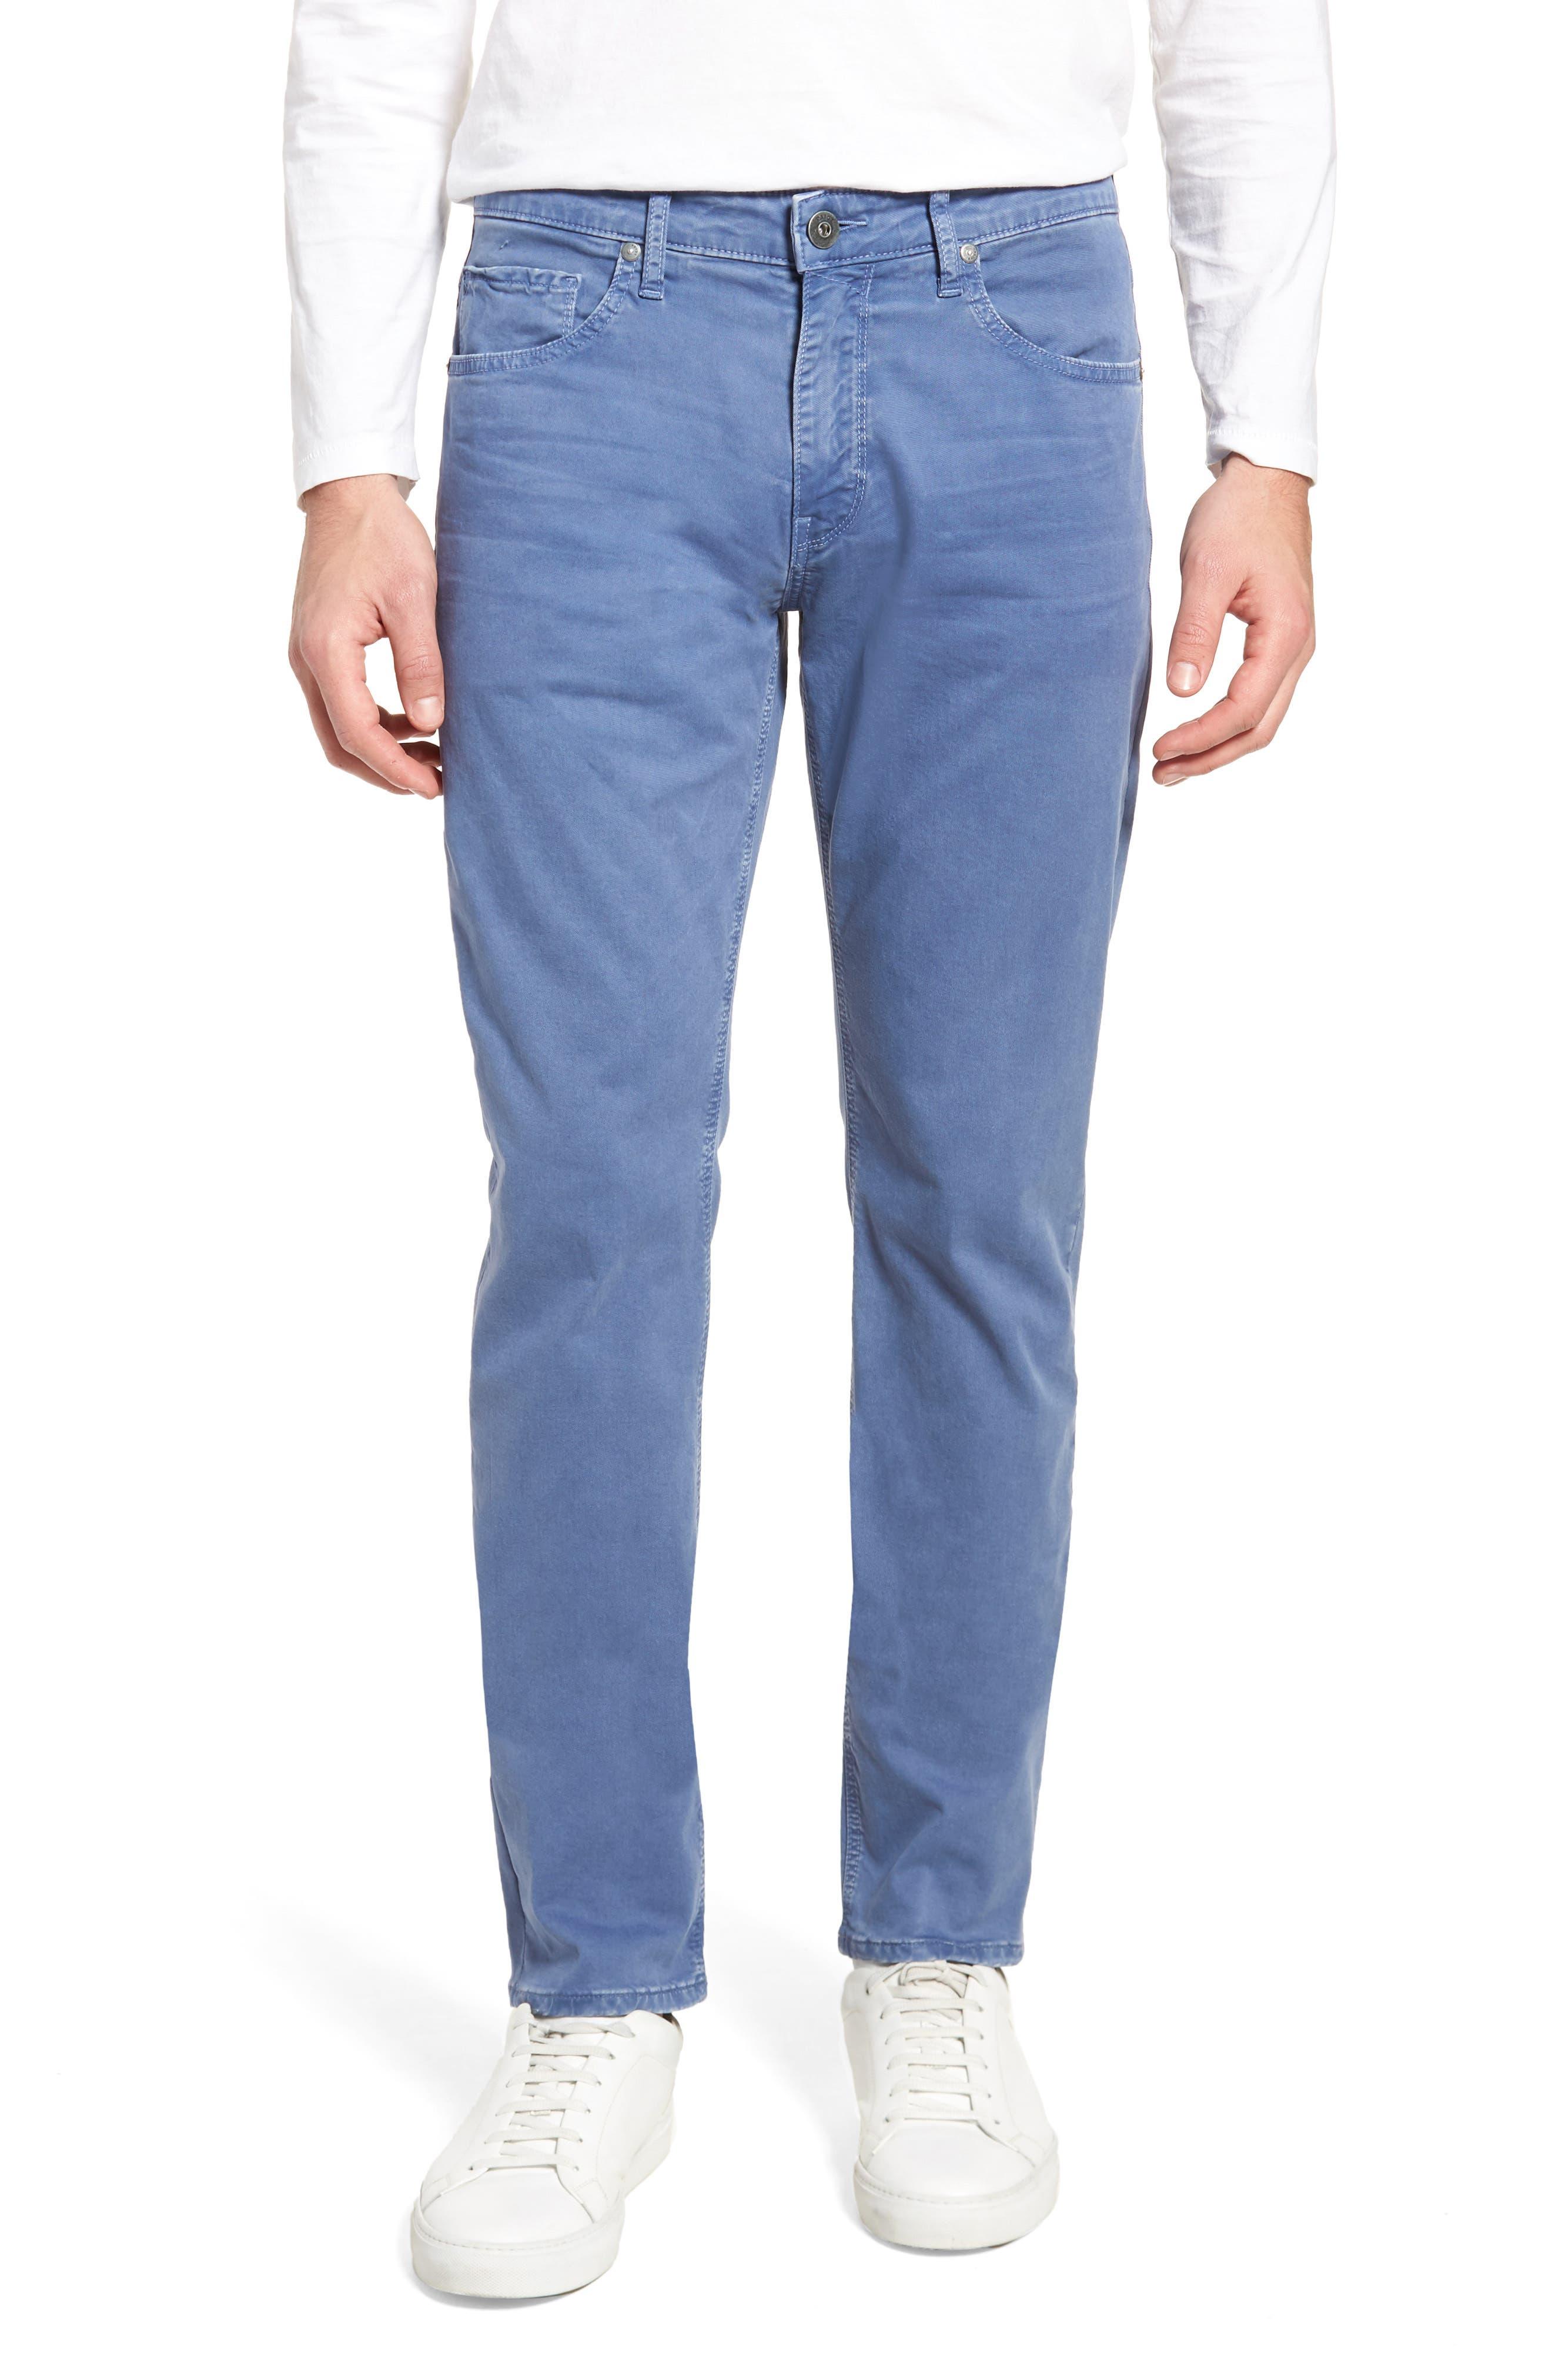 Lennox Slim Fit Five-Pocket Pants,                             Main thumbnail 1, color,                             Vintage Mariner